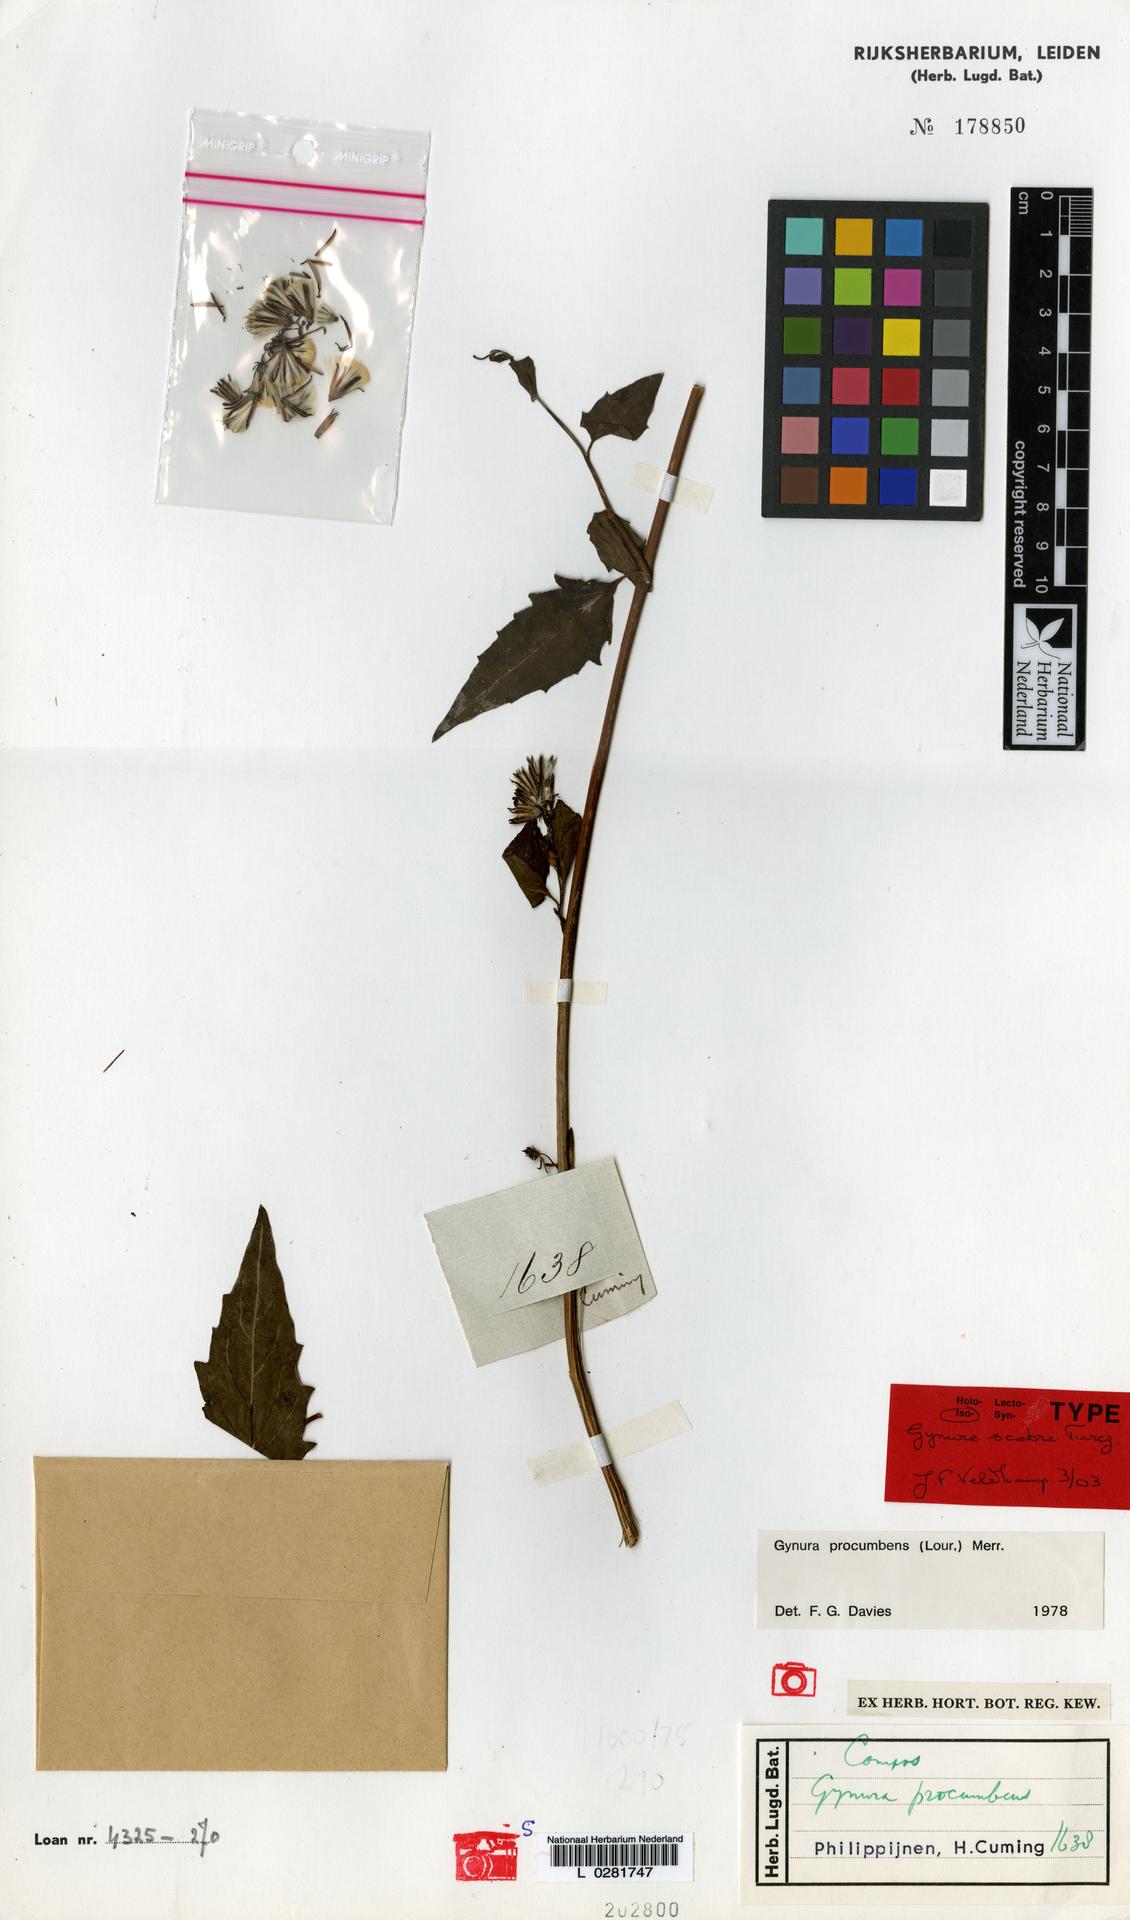 L  0281747 | Gynura procumbens (Lour.) Merr.